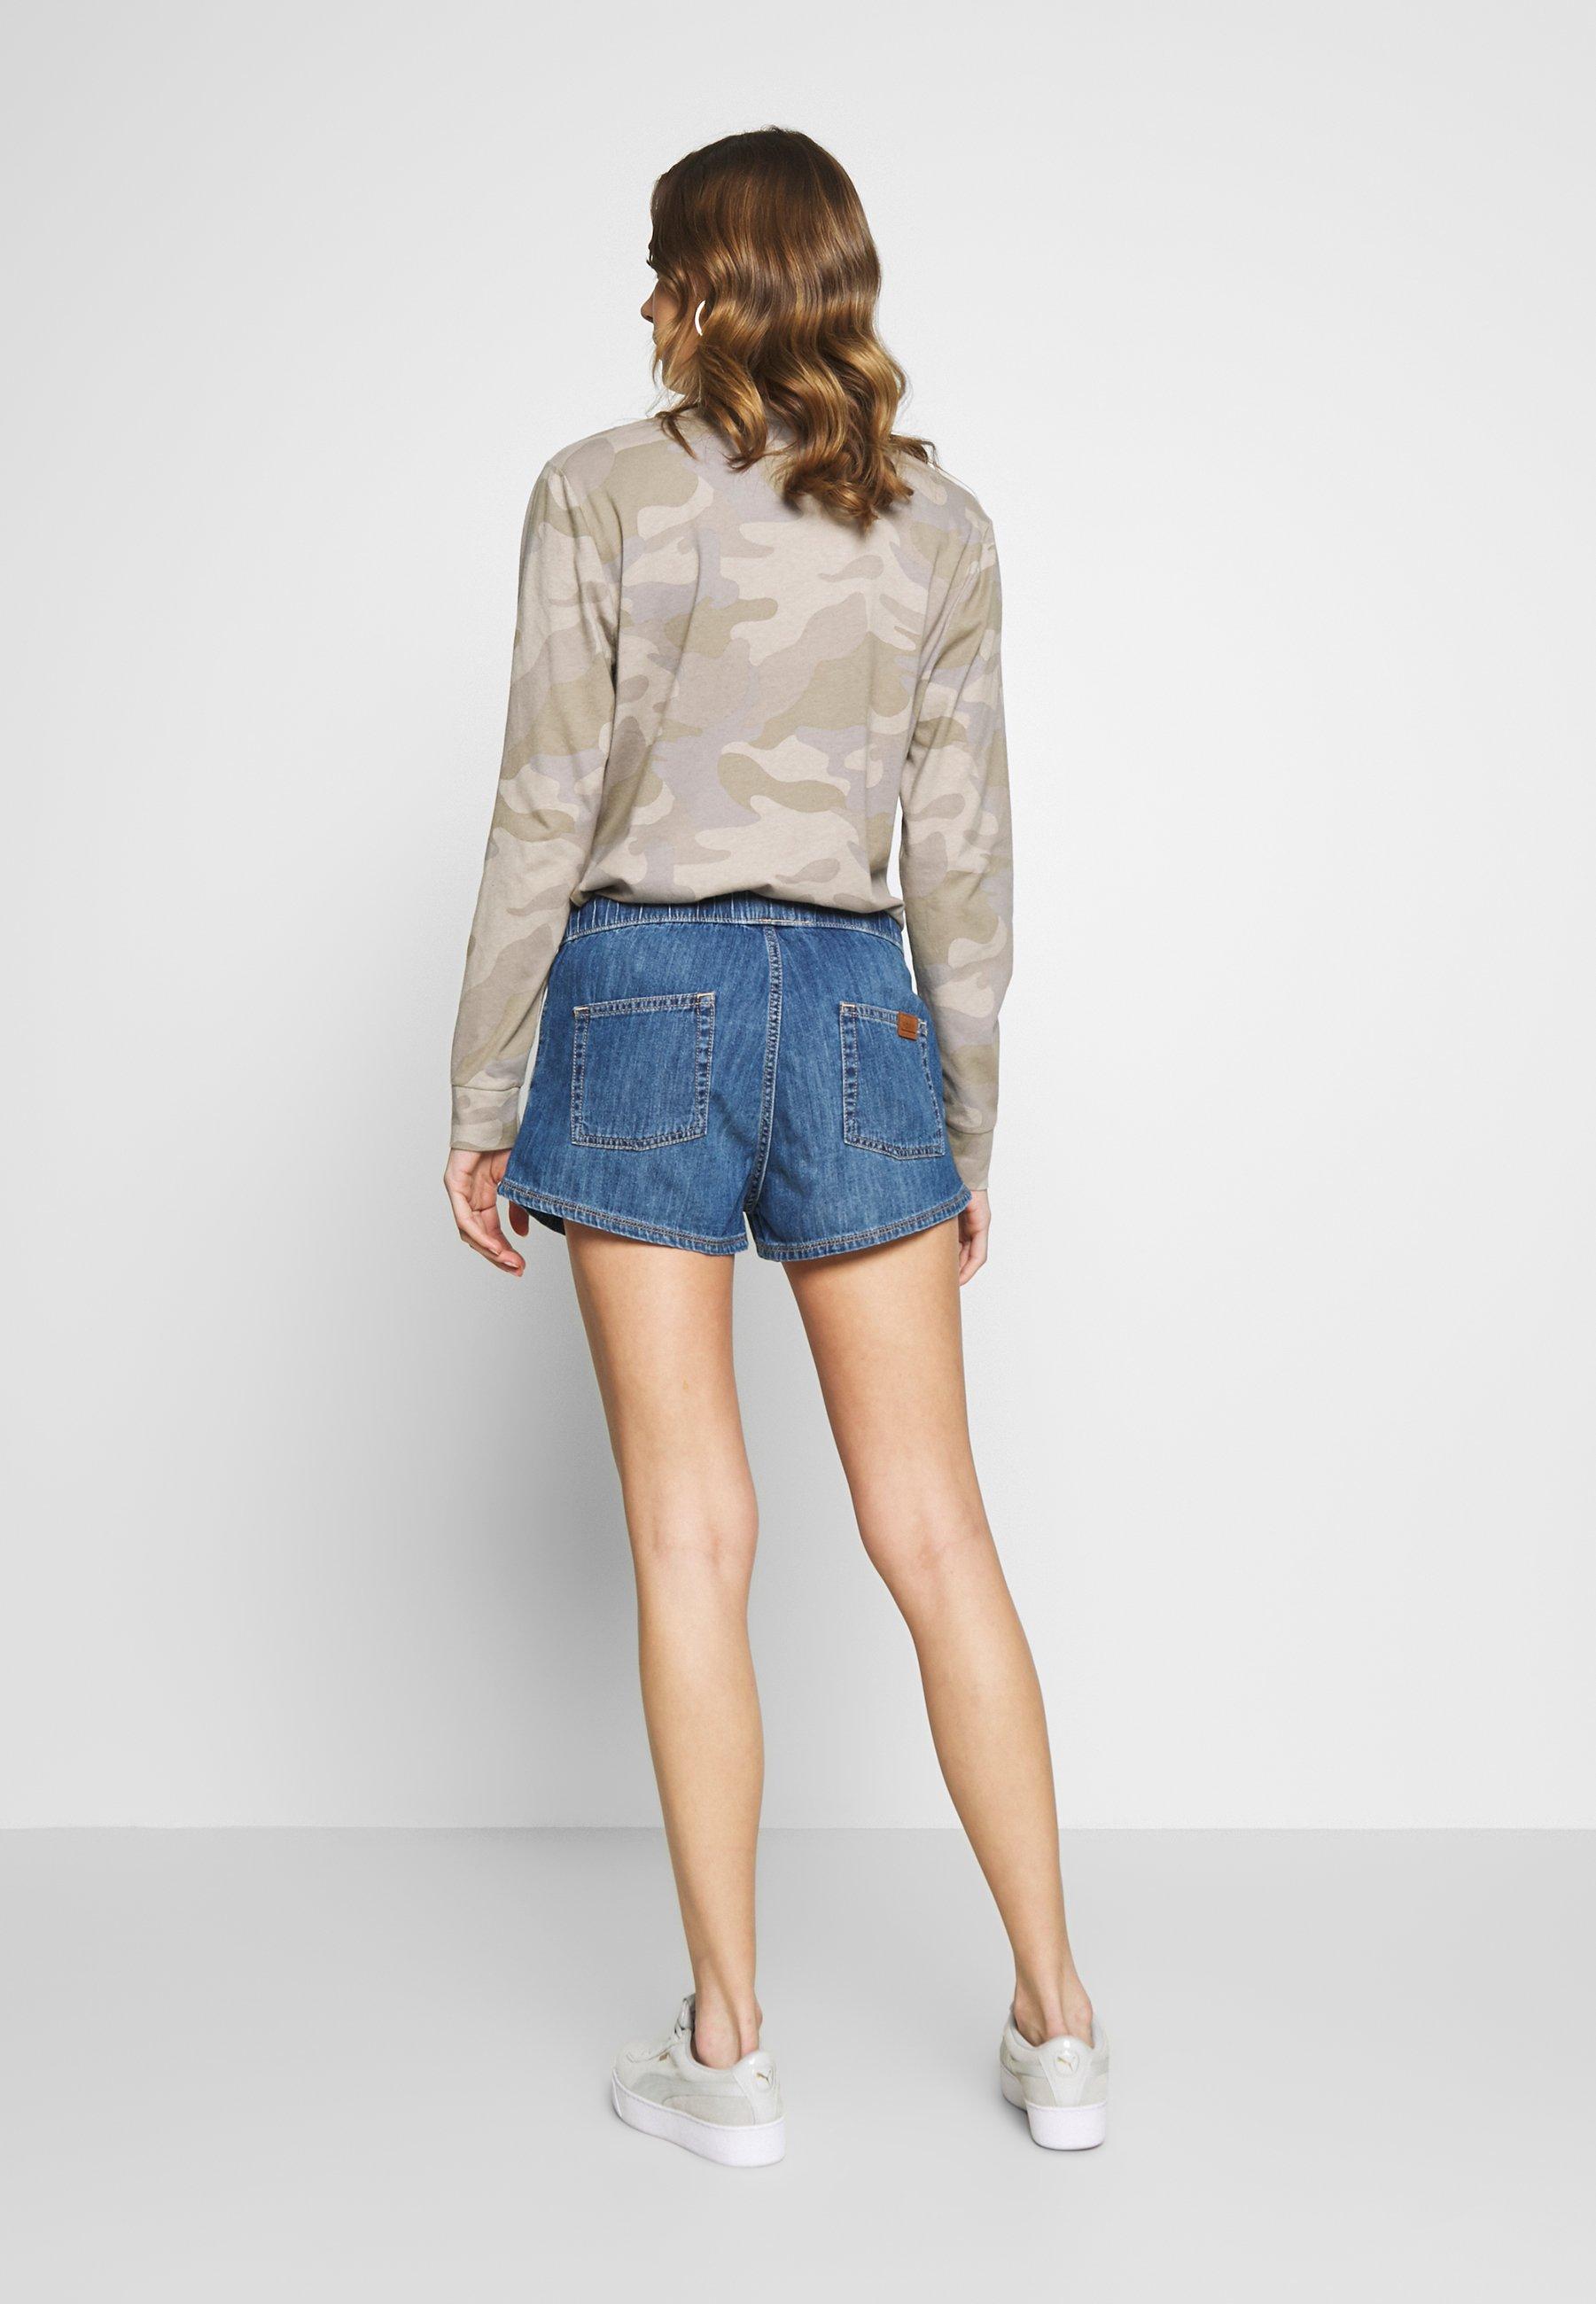 Roxy Go To The Beach - Jeans Short / Cowboy Shorts Medium Blue